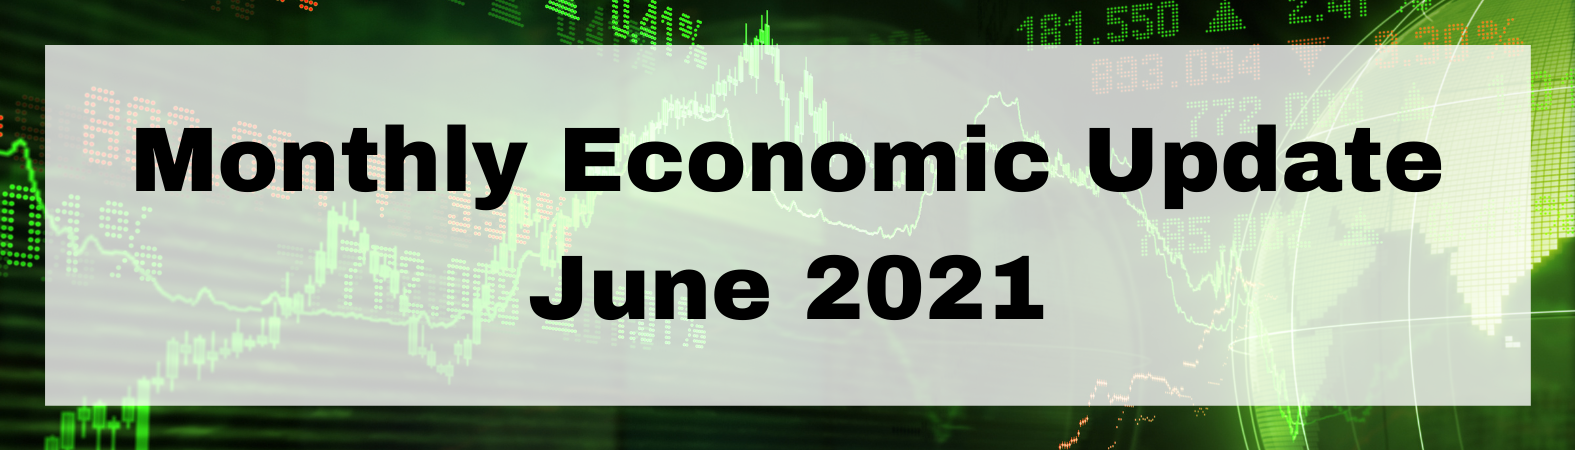 Monthly Economic Update June 2021 Thumbnail